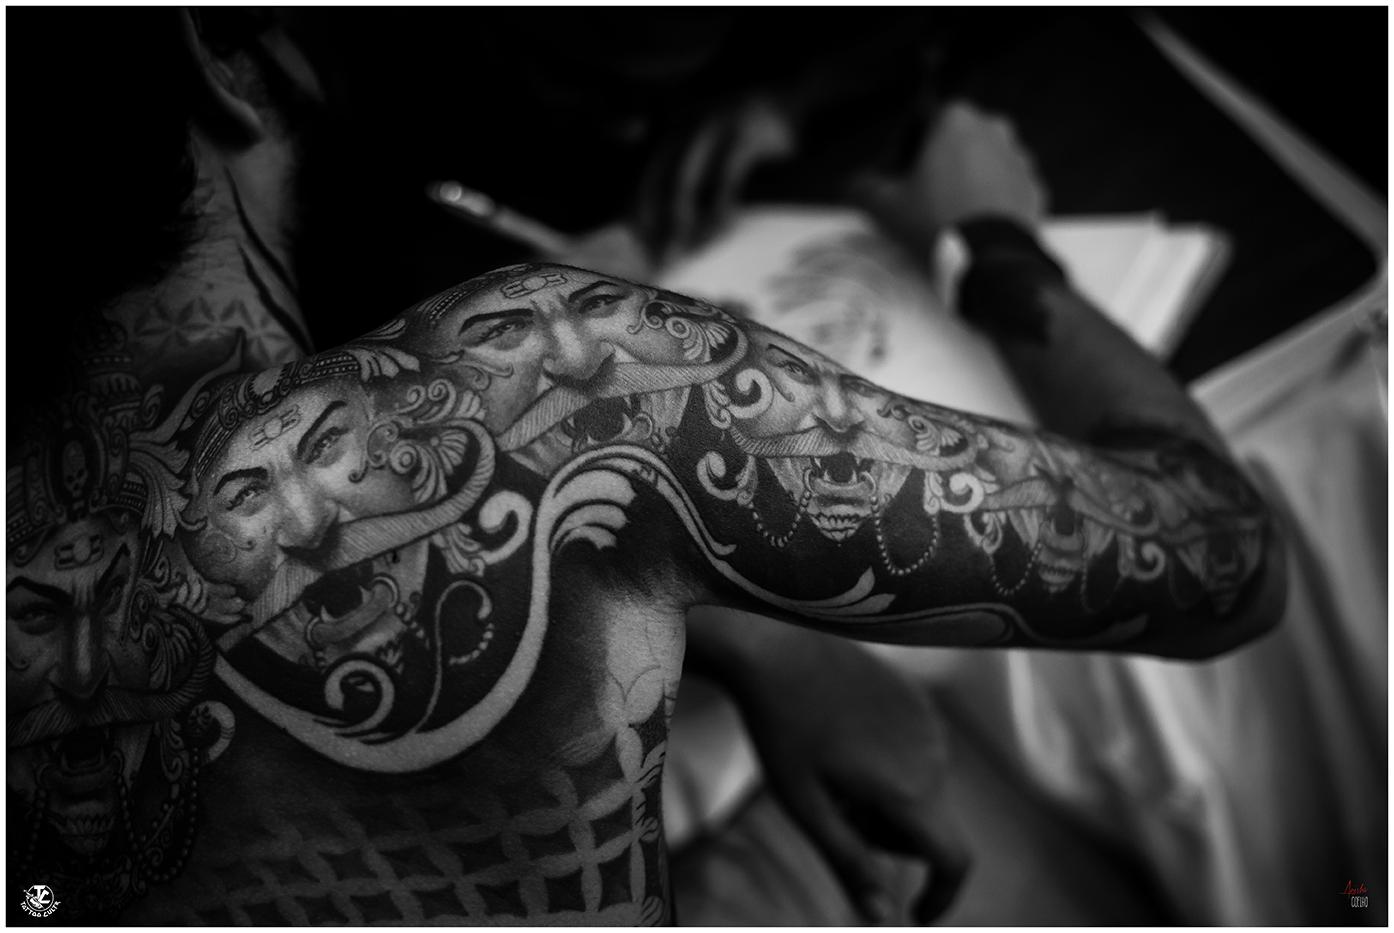 Goa Tattoo Festival 2018: Stunning photographs capture the essence of Goa's tattoo party